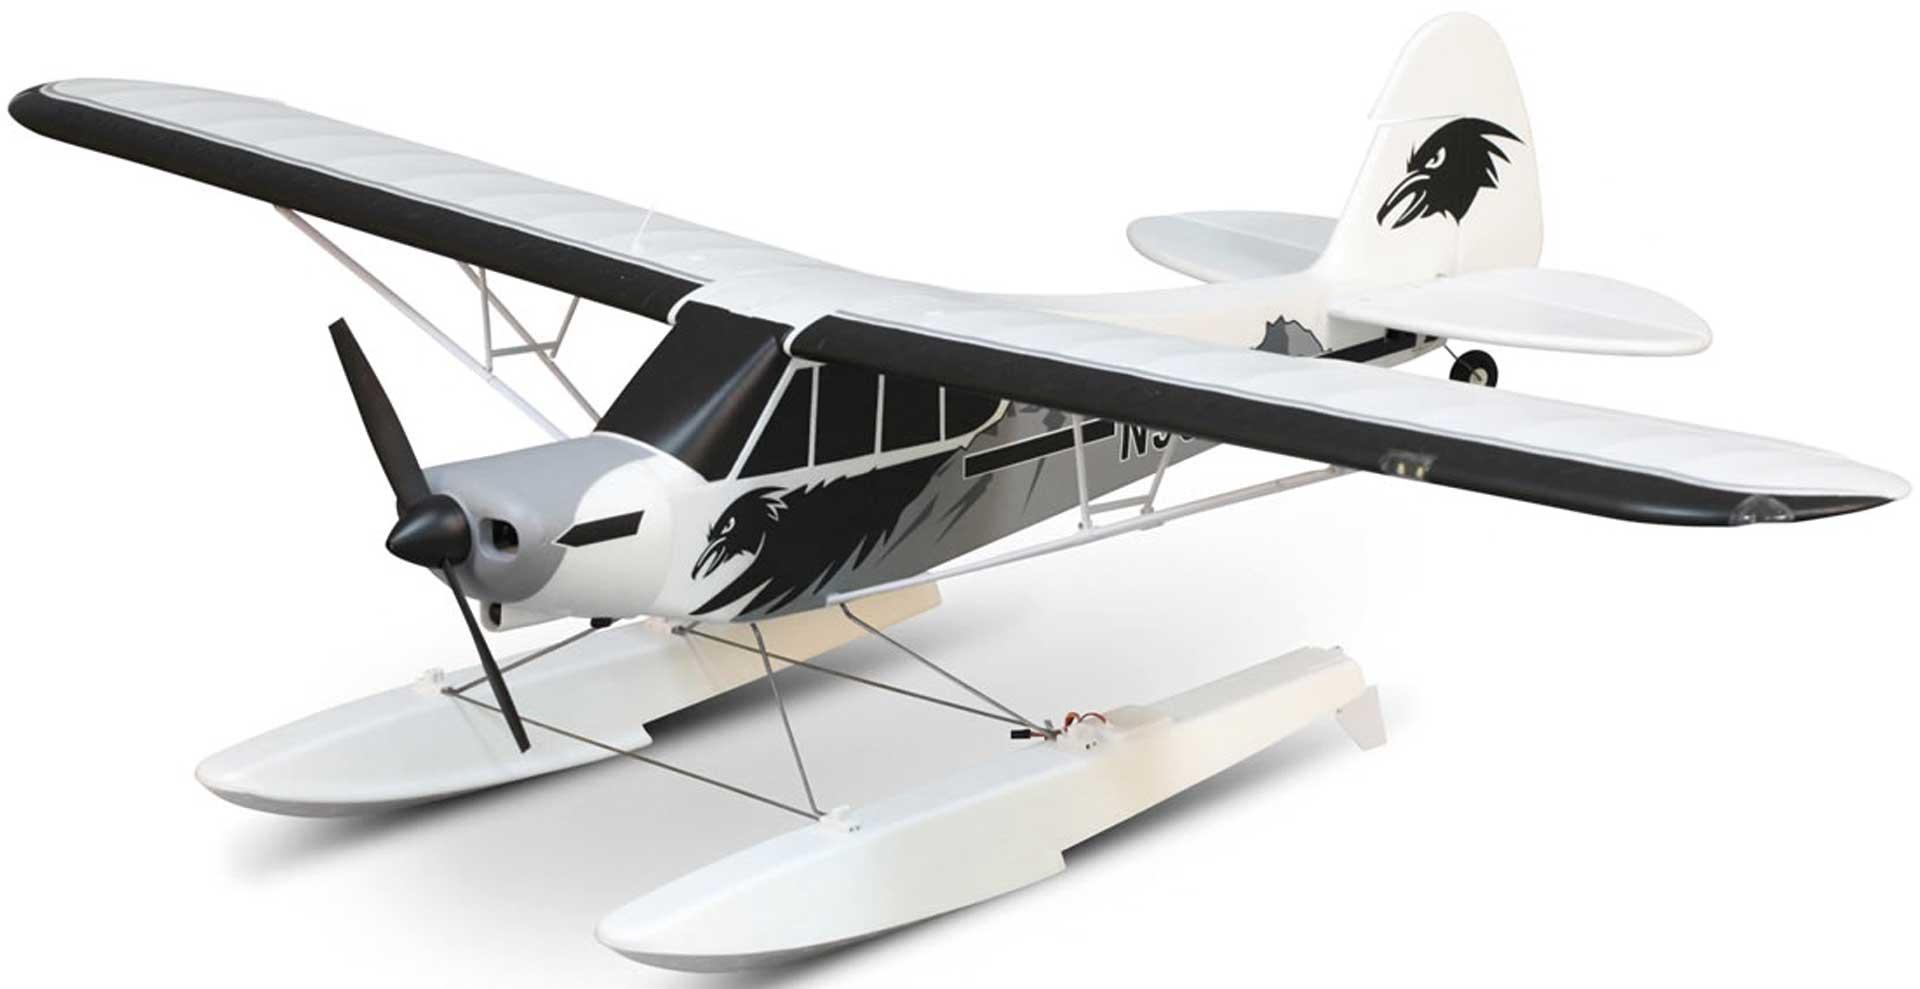 FMS Piper PA-18 Super Cub PNP + Schwimmer - 170 cm - Combo incl. Reflex Gyro System